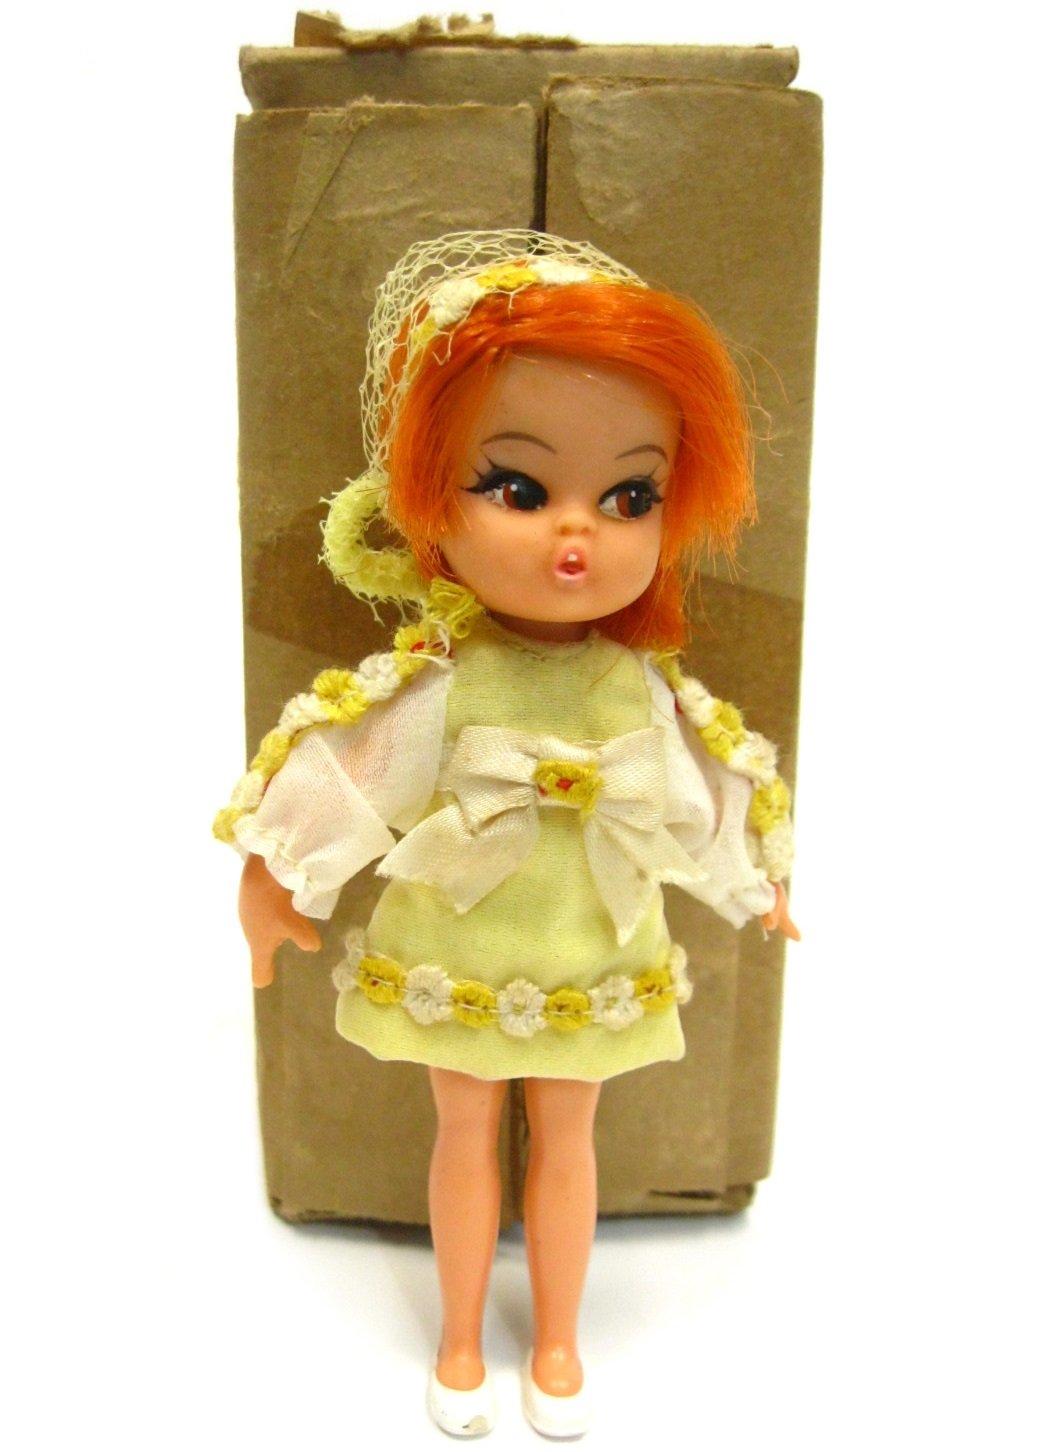 Vintage 1960's Hasbro Dolly Darlings Honey Doll Liddle Kiddles w/Rare Mailer Box